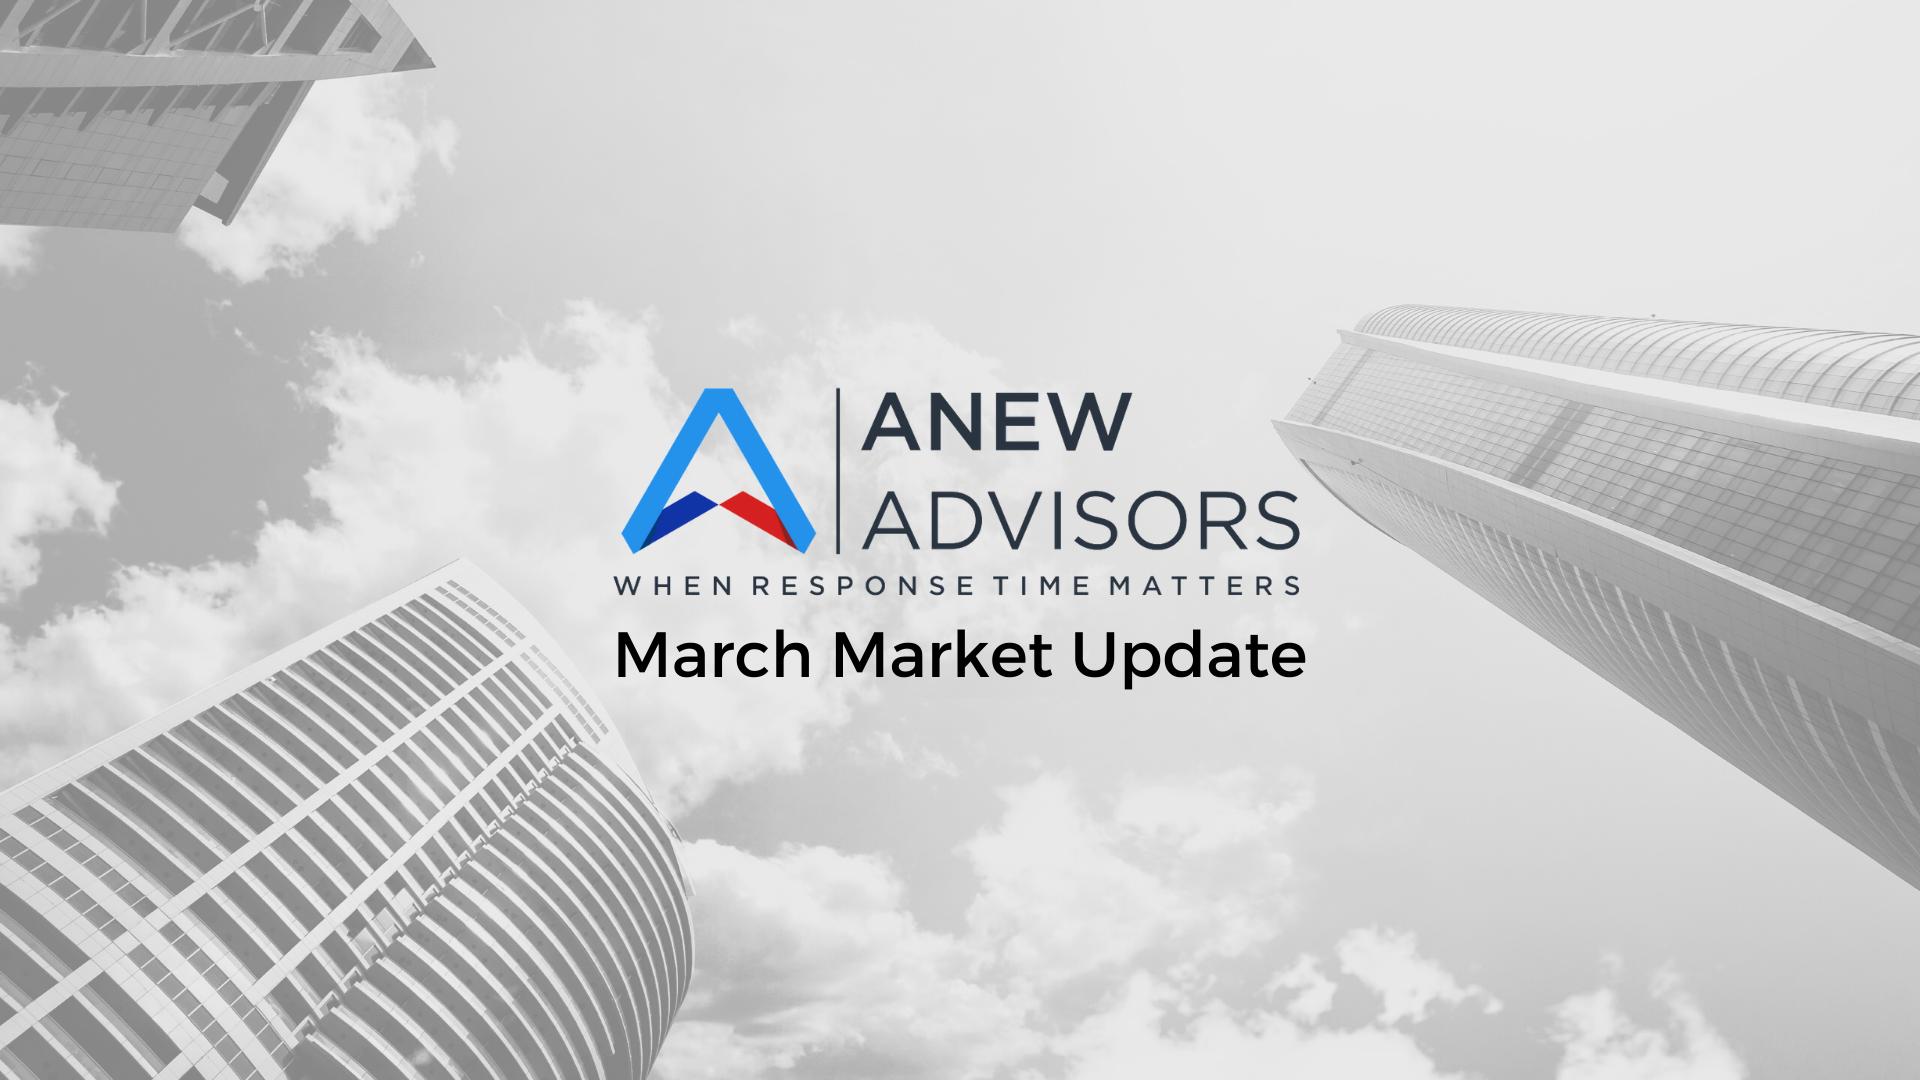 March Market Update Thumbnail